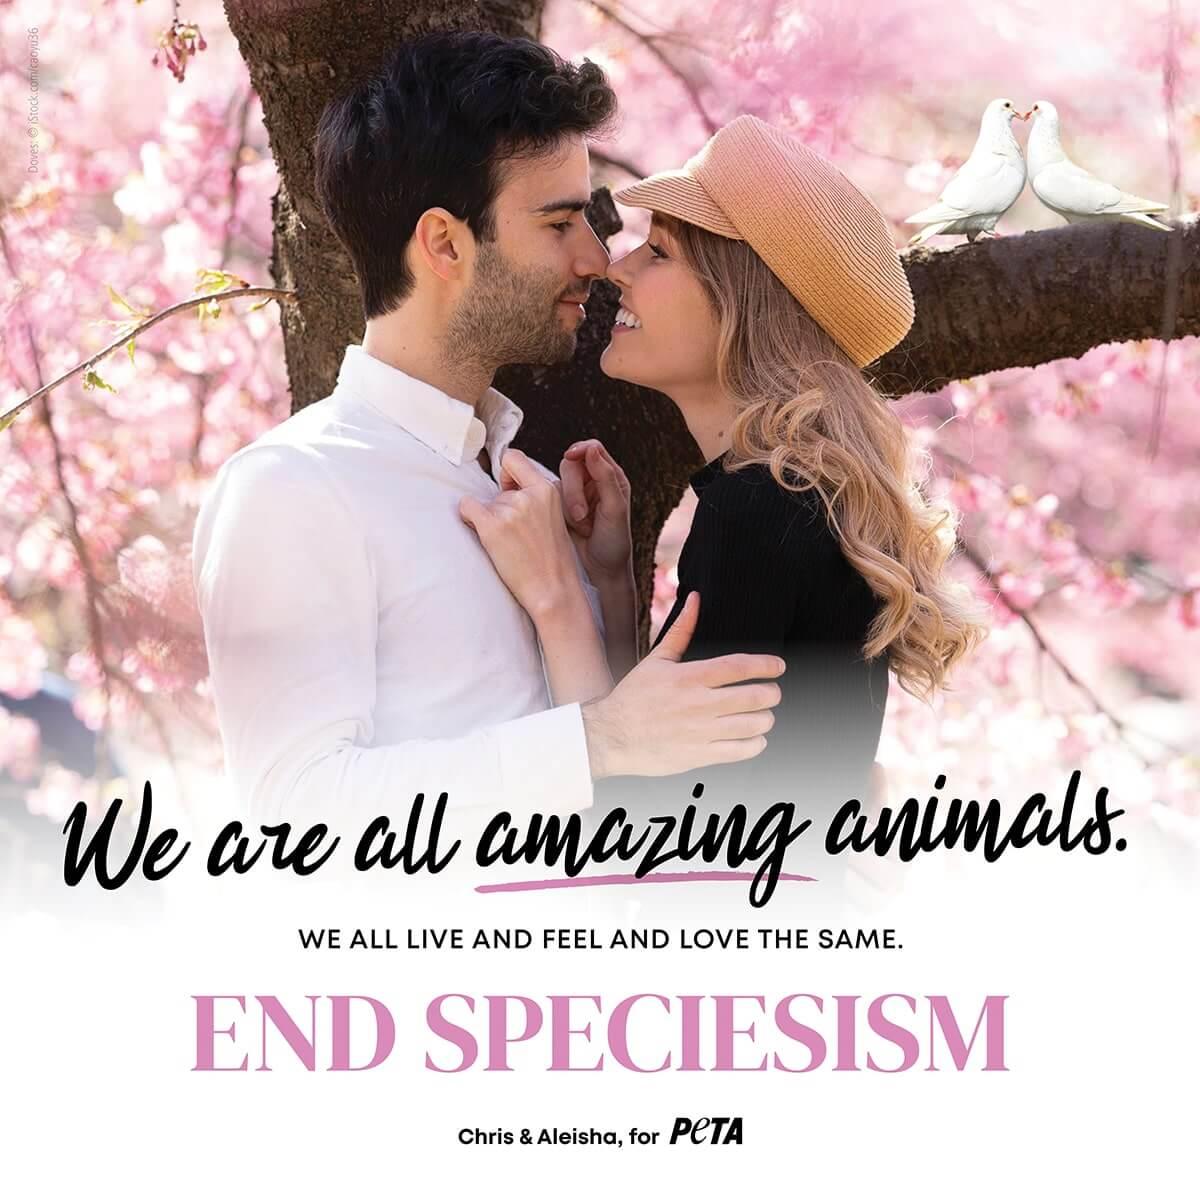 Chris and Aleisha pose for a PETA ad against speciesism